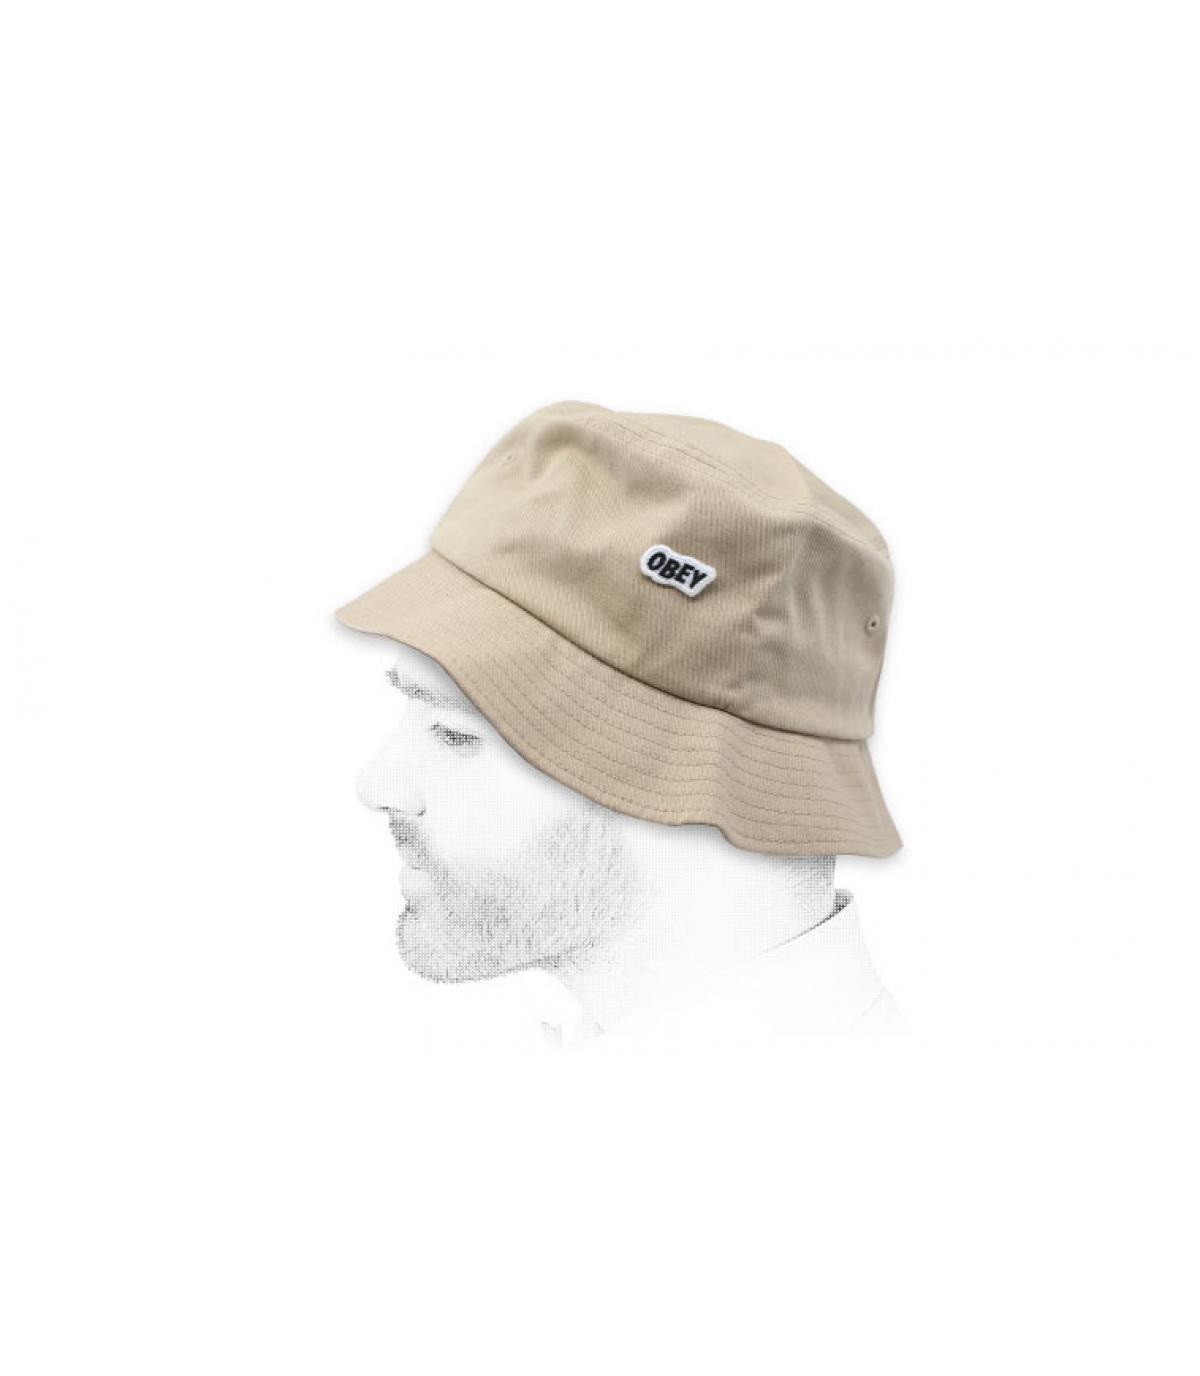 gorro pescador Obey beis